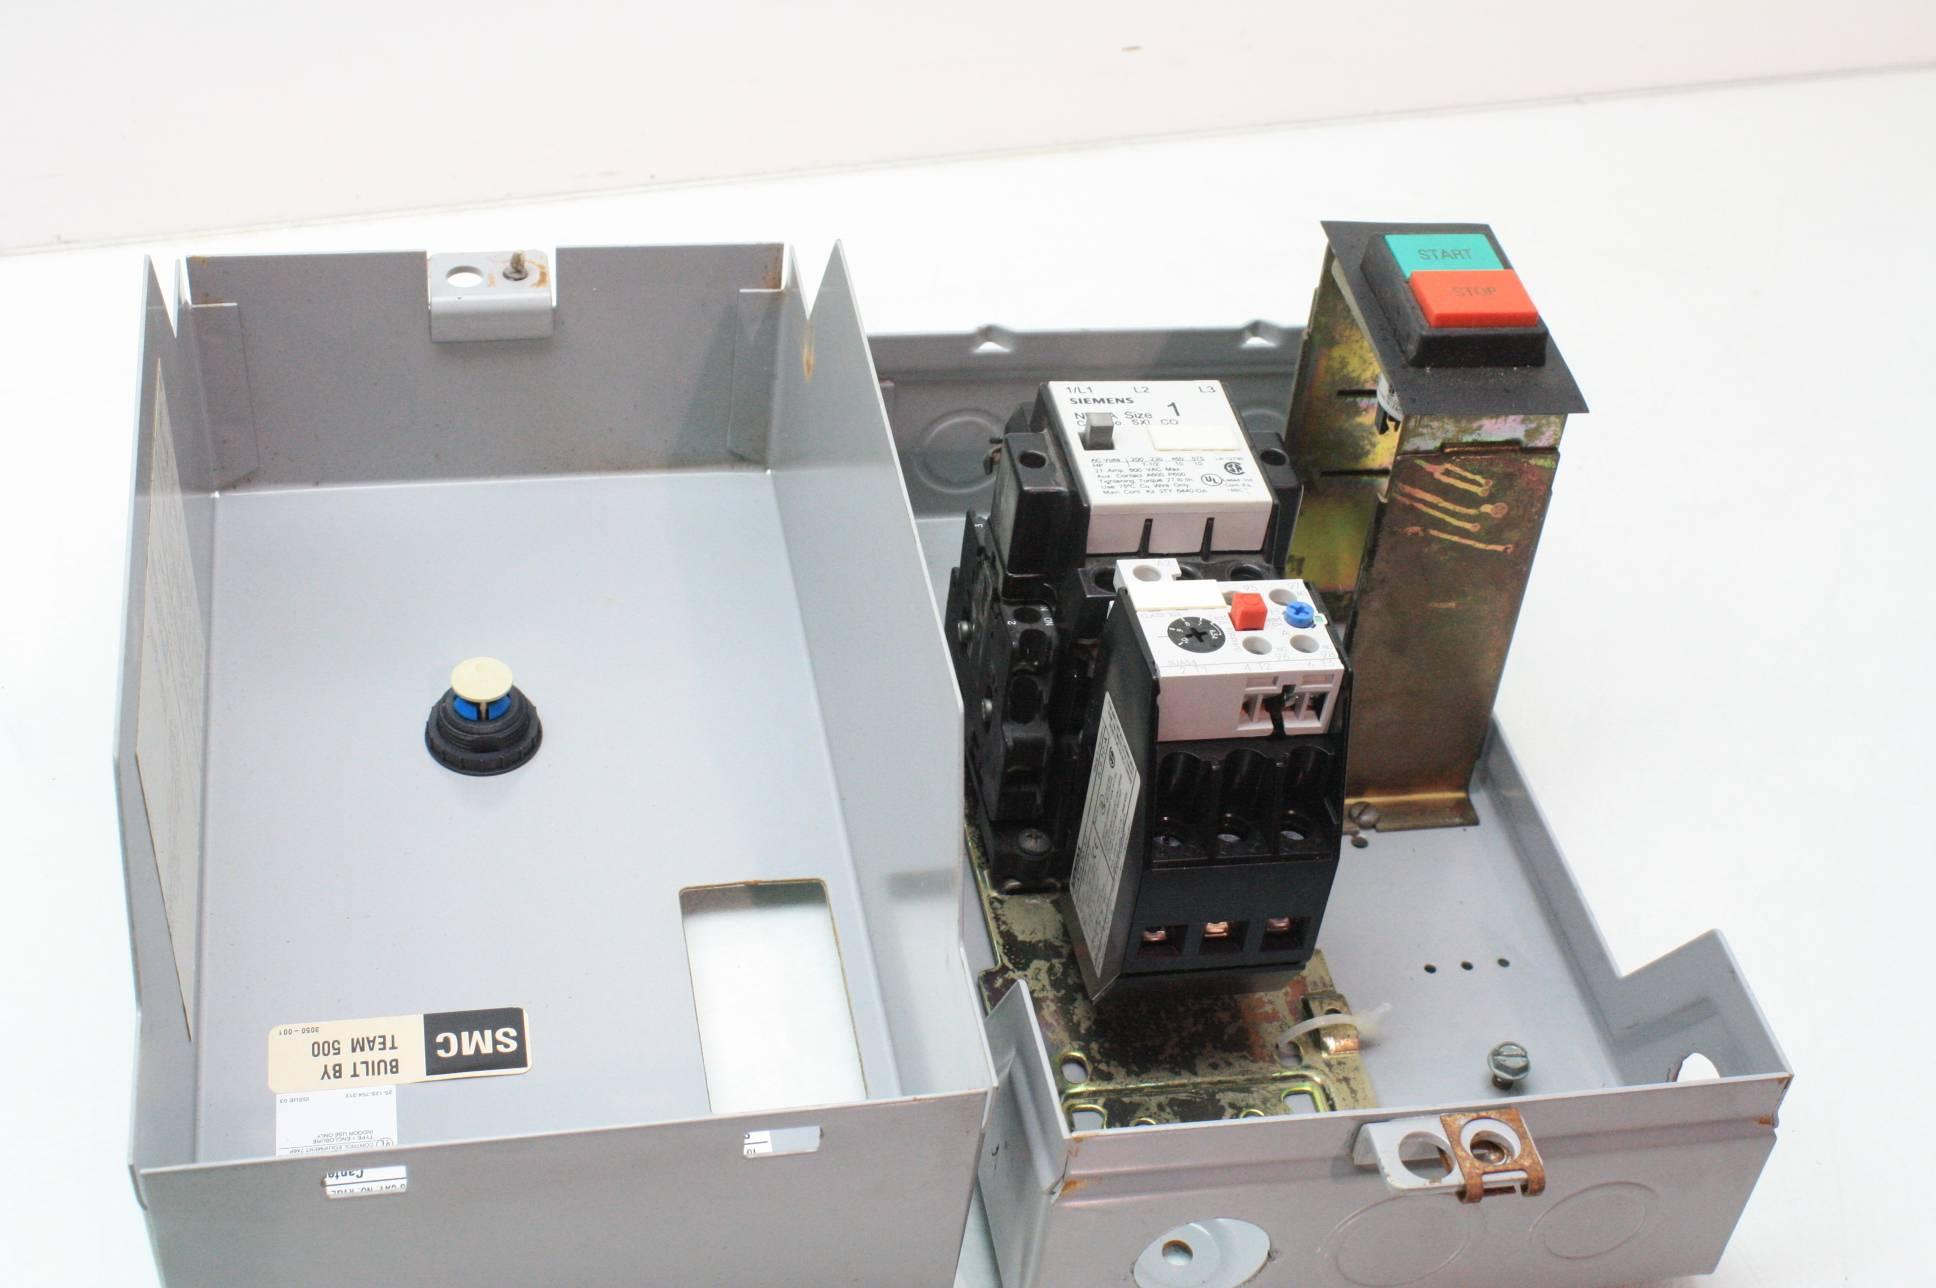 Siemens Sxl Cg Co Motor Starter Nema Size 1 With Wall